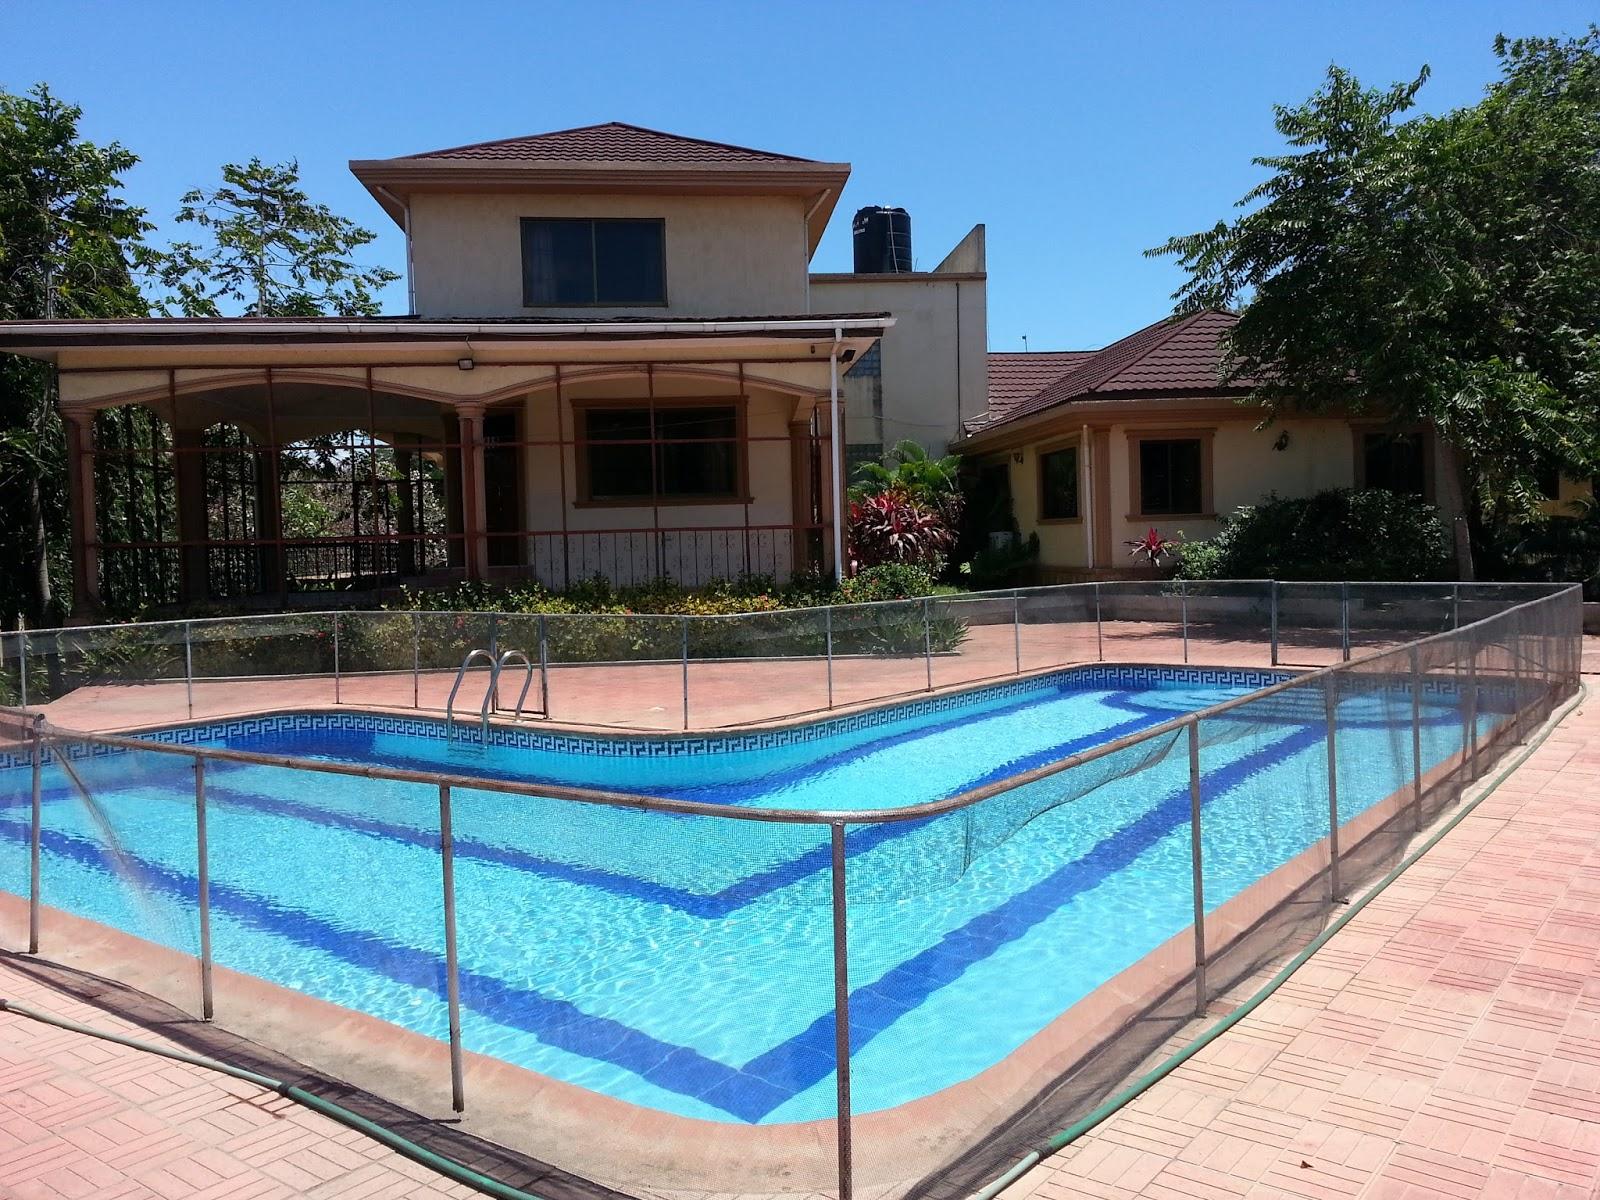 Tanzania Online Property Executive Diplomatic House To Let At Ada Estate Dar Es Salaam